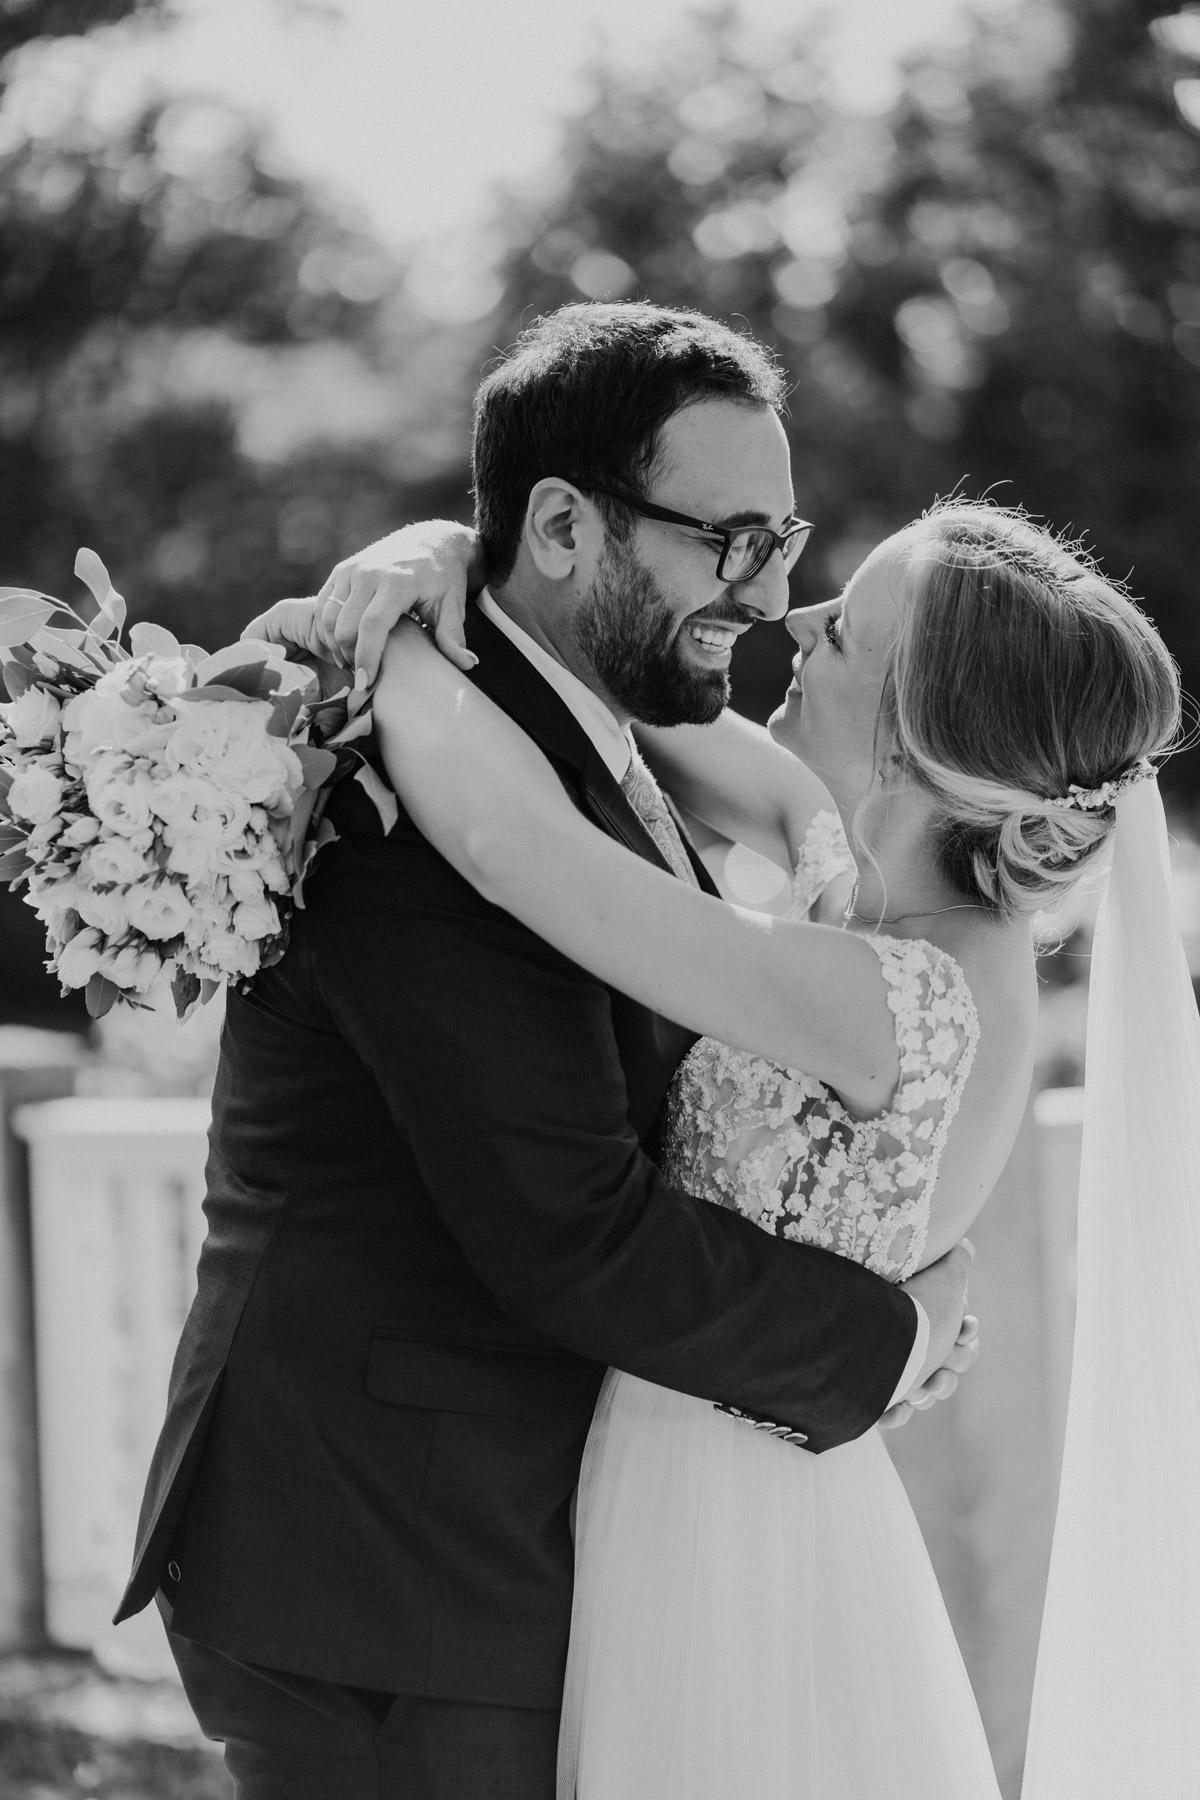 Brautpaarshooting Ideen Hochzeitsfotos Hochzeitspaar Fotos #Hochzeitsfotos aus Berlin © www.hochzeitslicht.de #hochzeitslicht #Brautpaarbilder #Hochzeitsshooting